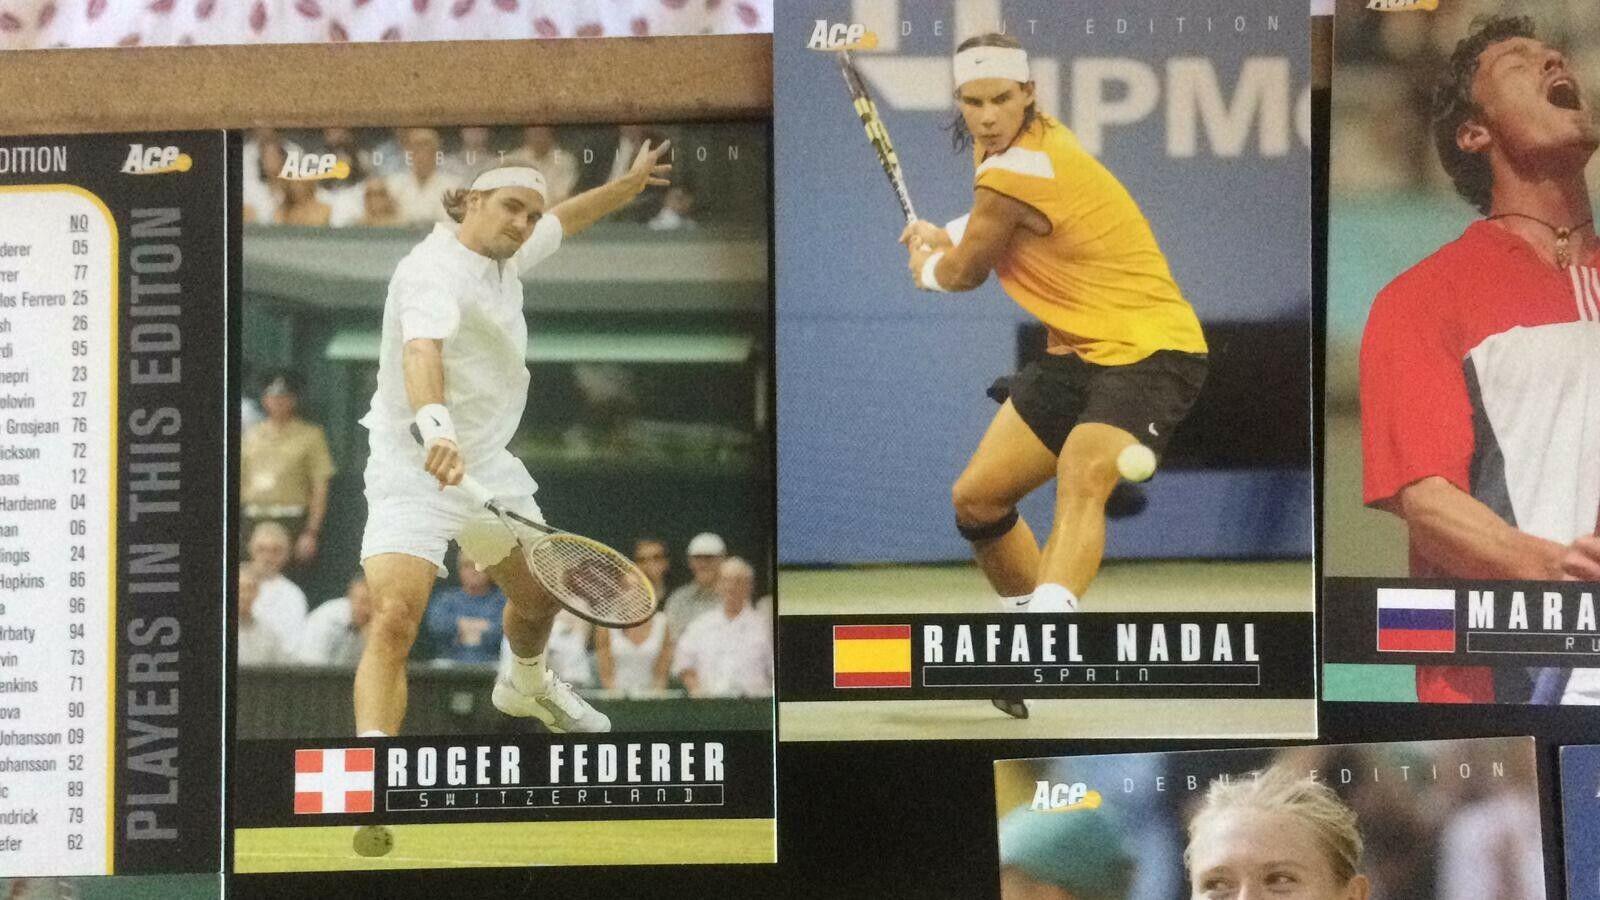 Tennis ace authentic 2005 - 98 cards roger federer rafael nadal agassi sharapova